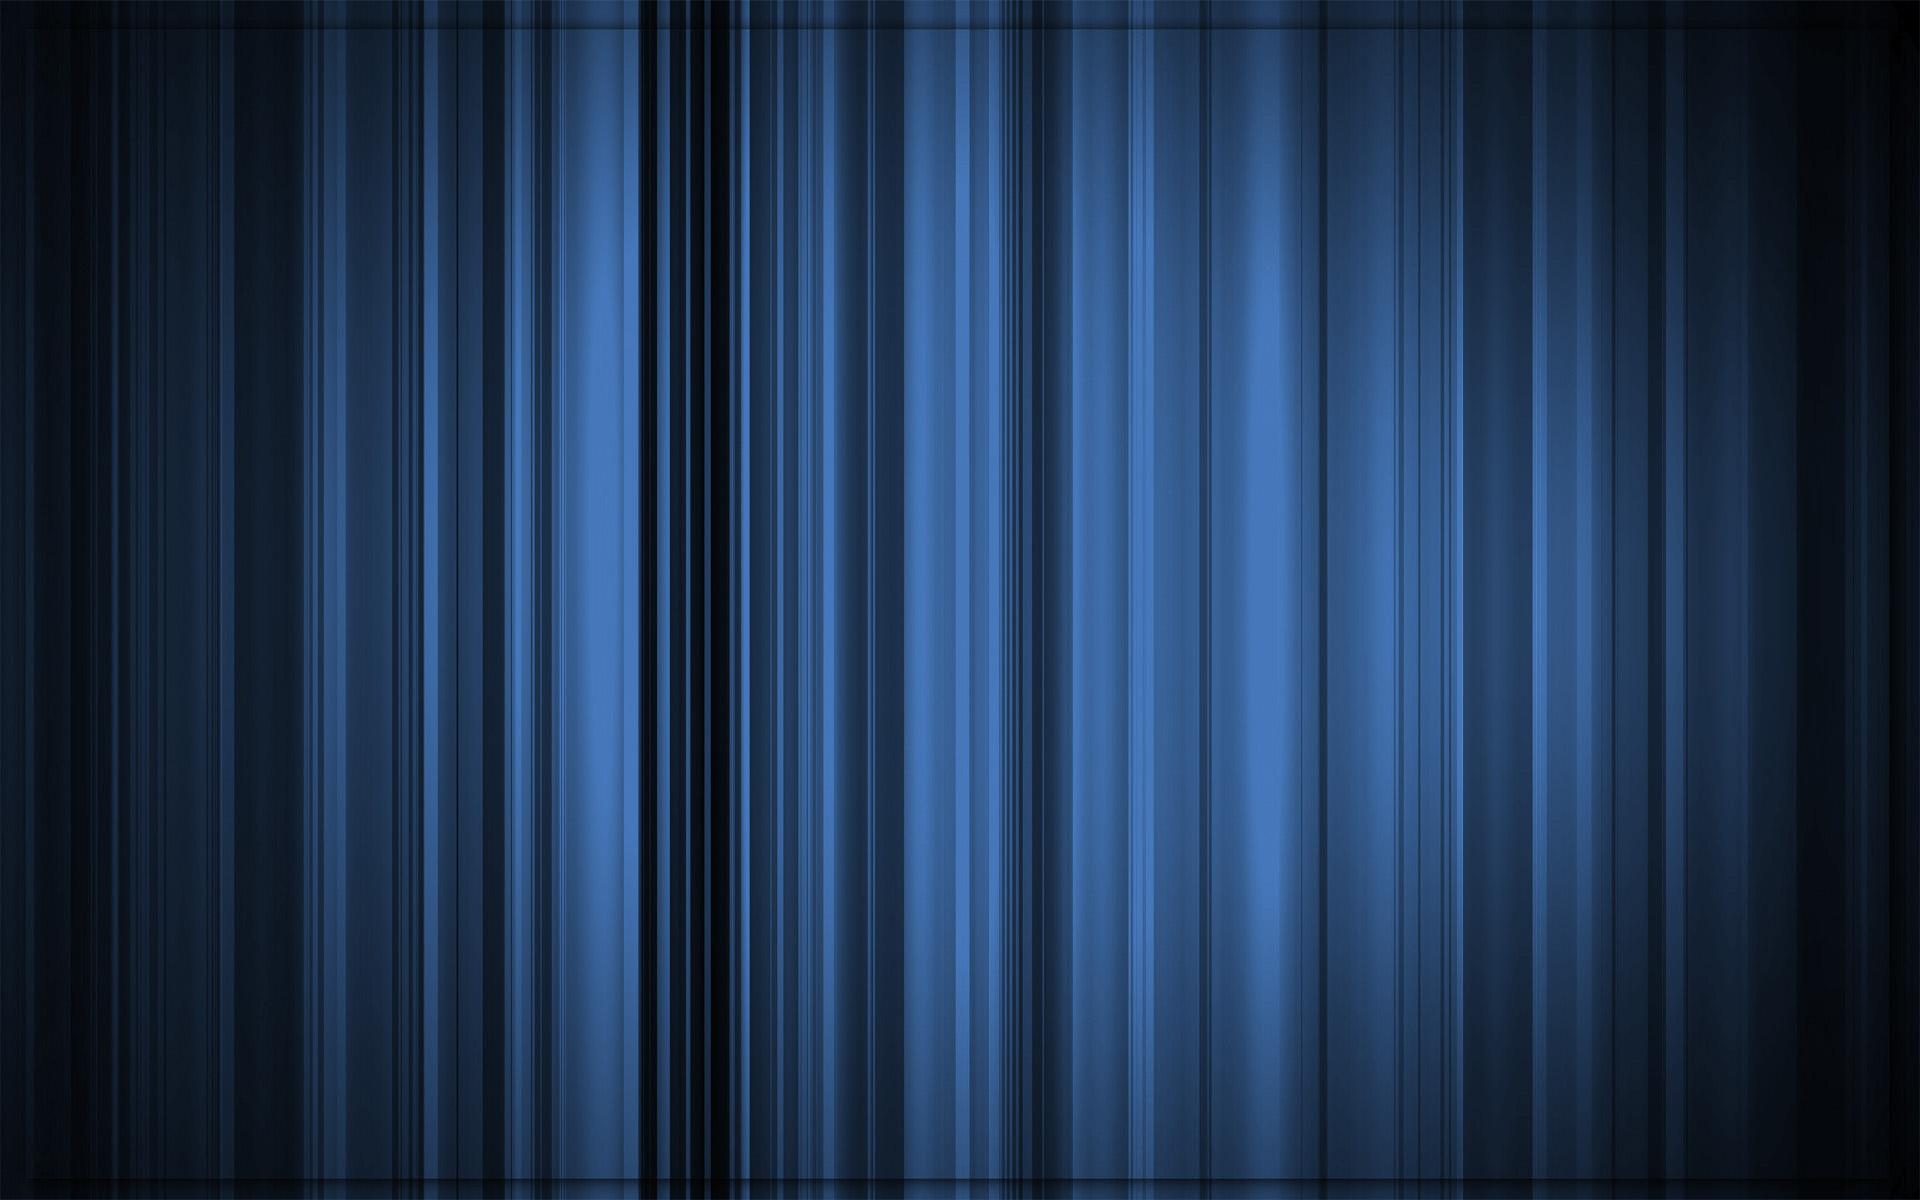 Blue Striped Wallpaper: Blue Patterns Striped Texture Wallpaper